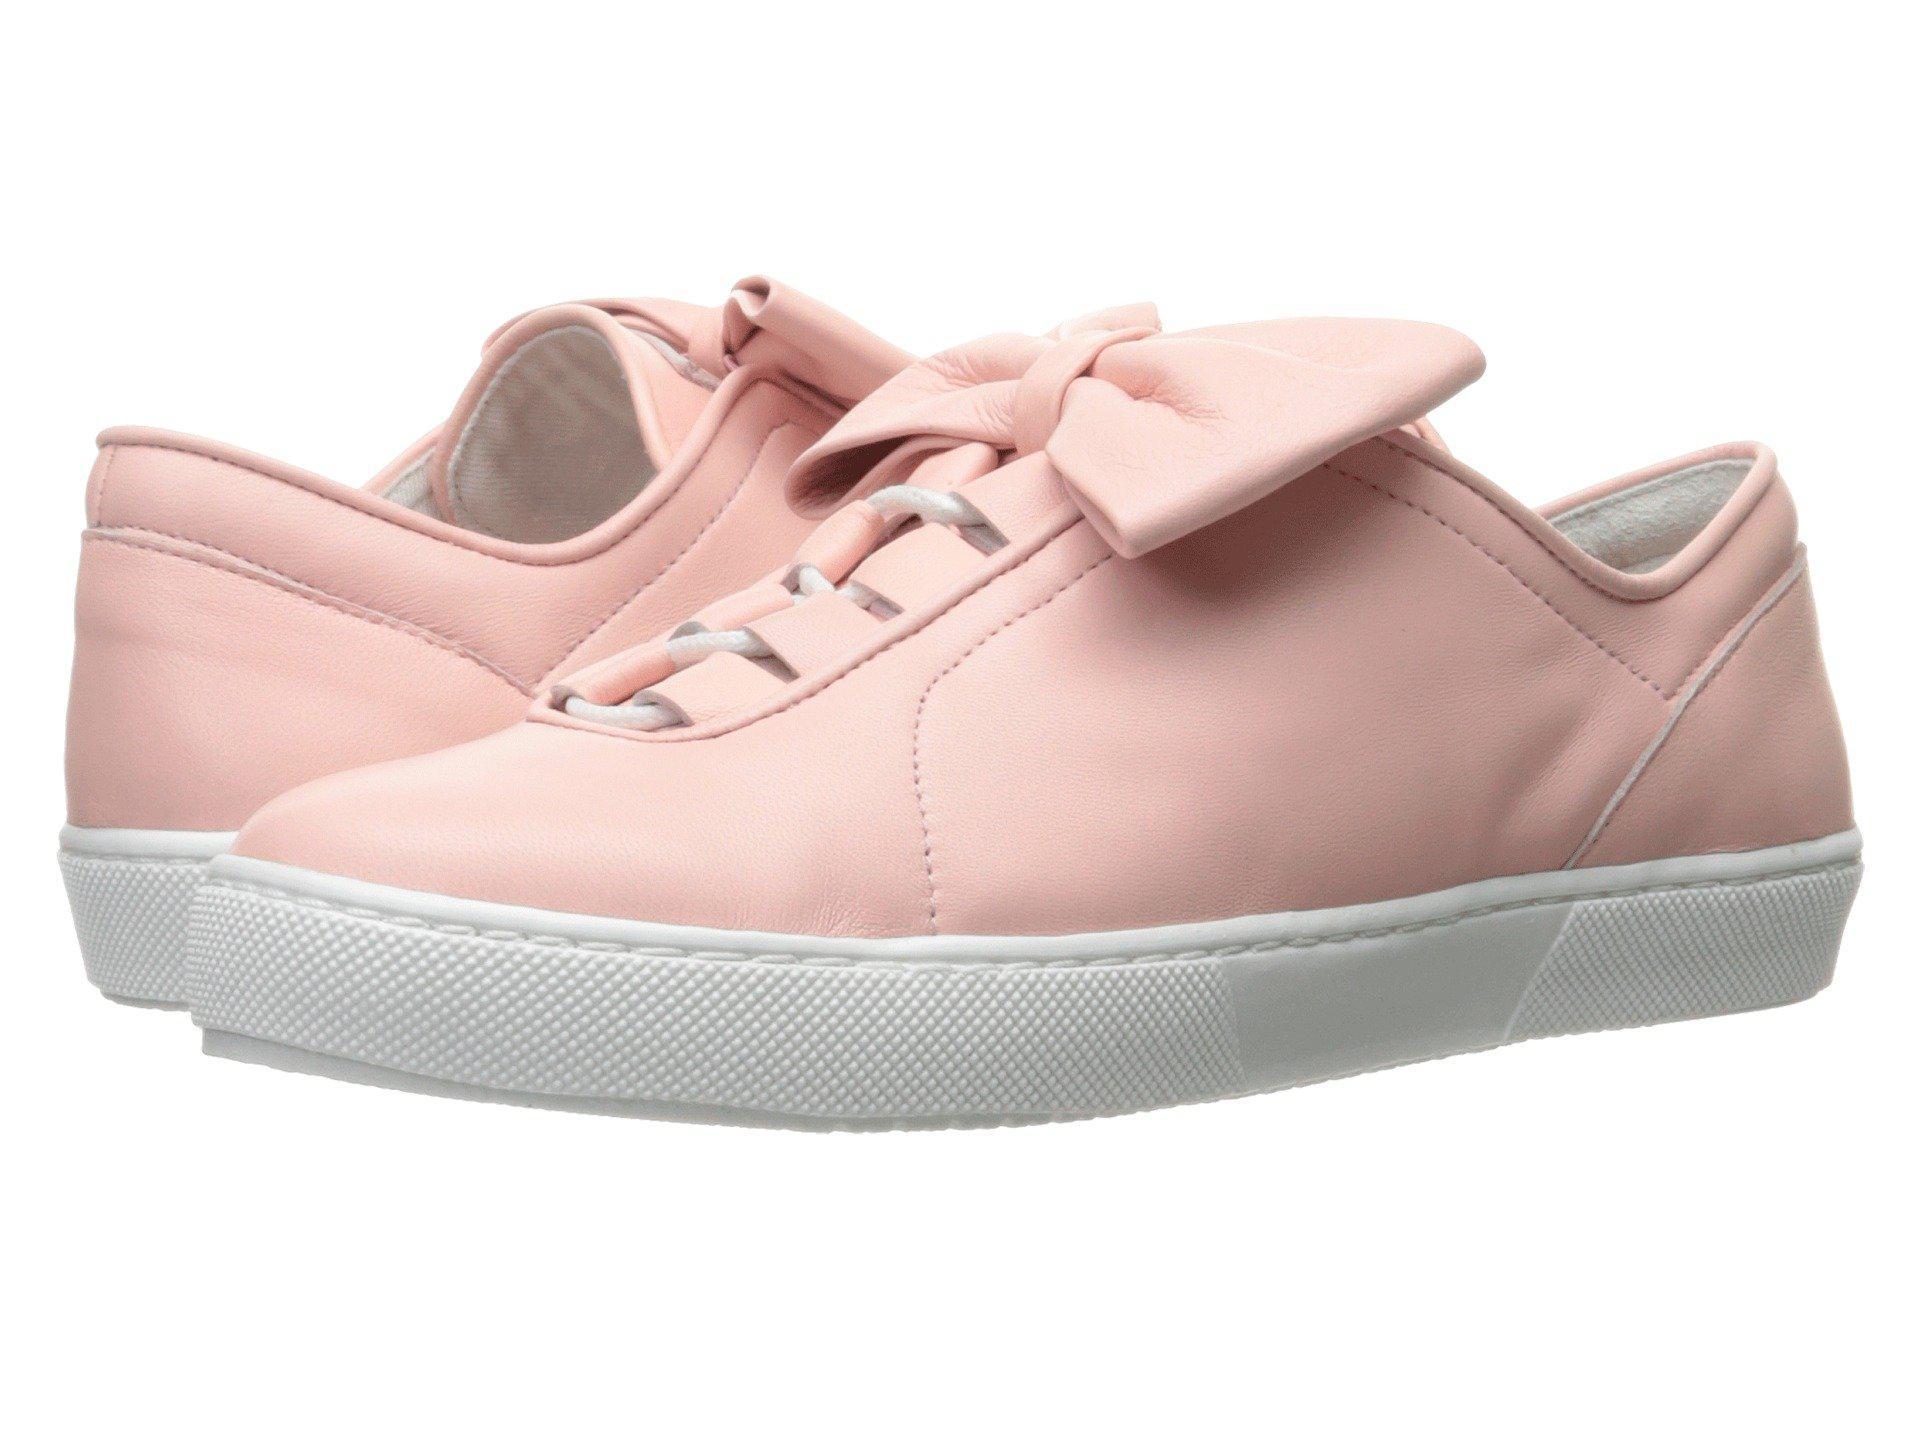 Boutique Moschino Tropic Slip-On Sneakers oYi440E0aB